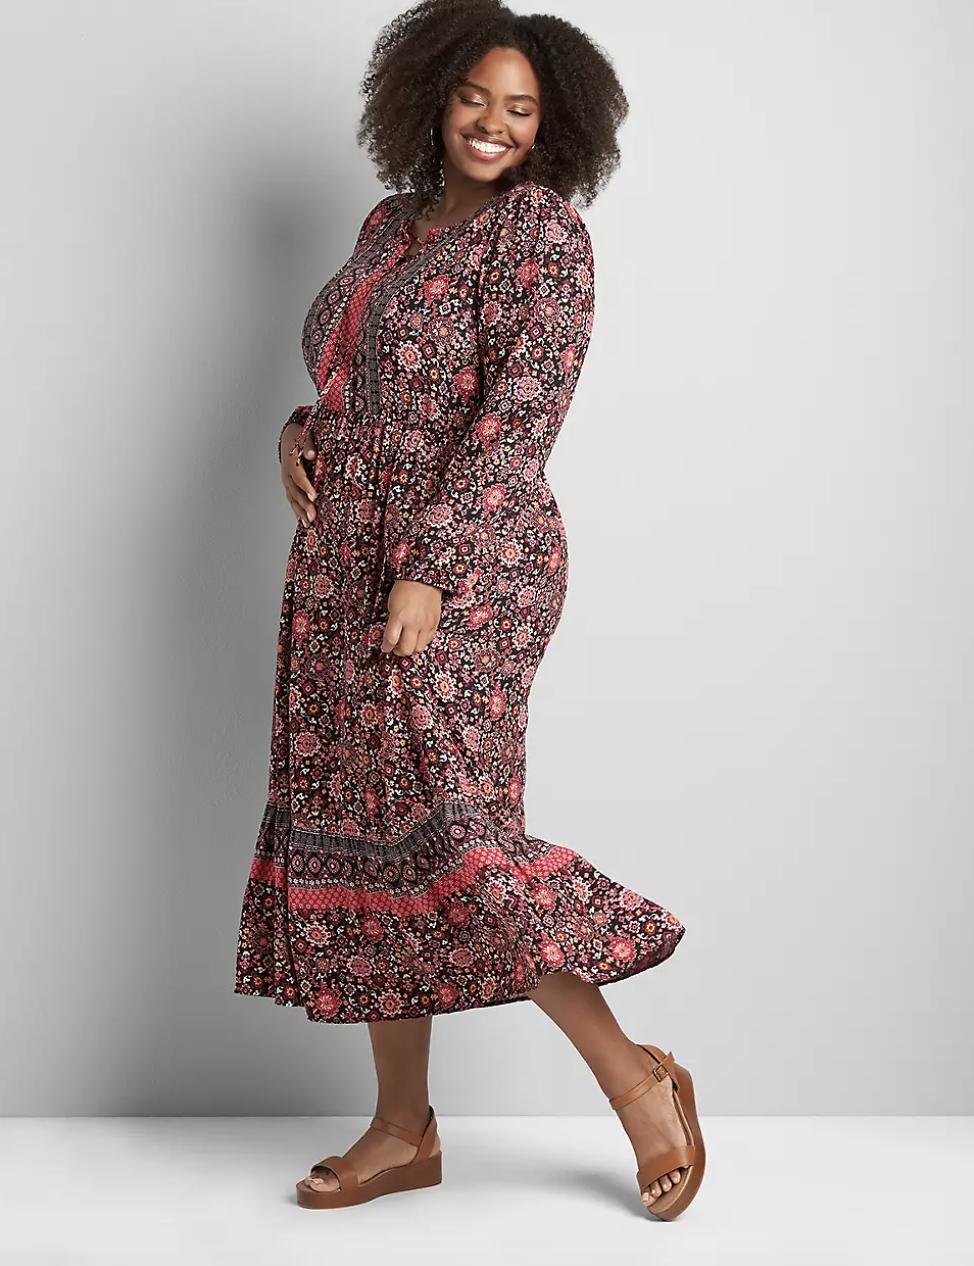 model in midi length printed dress